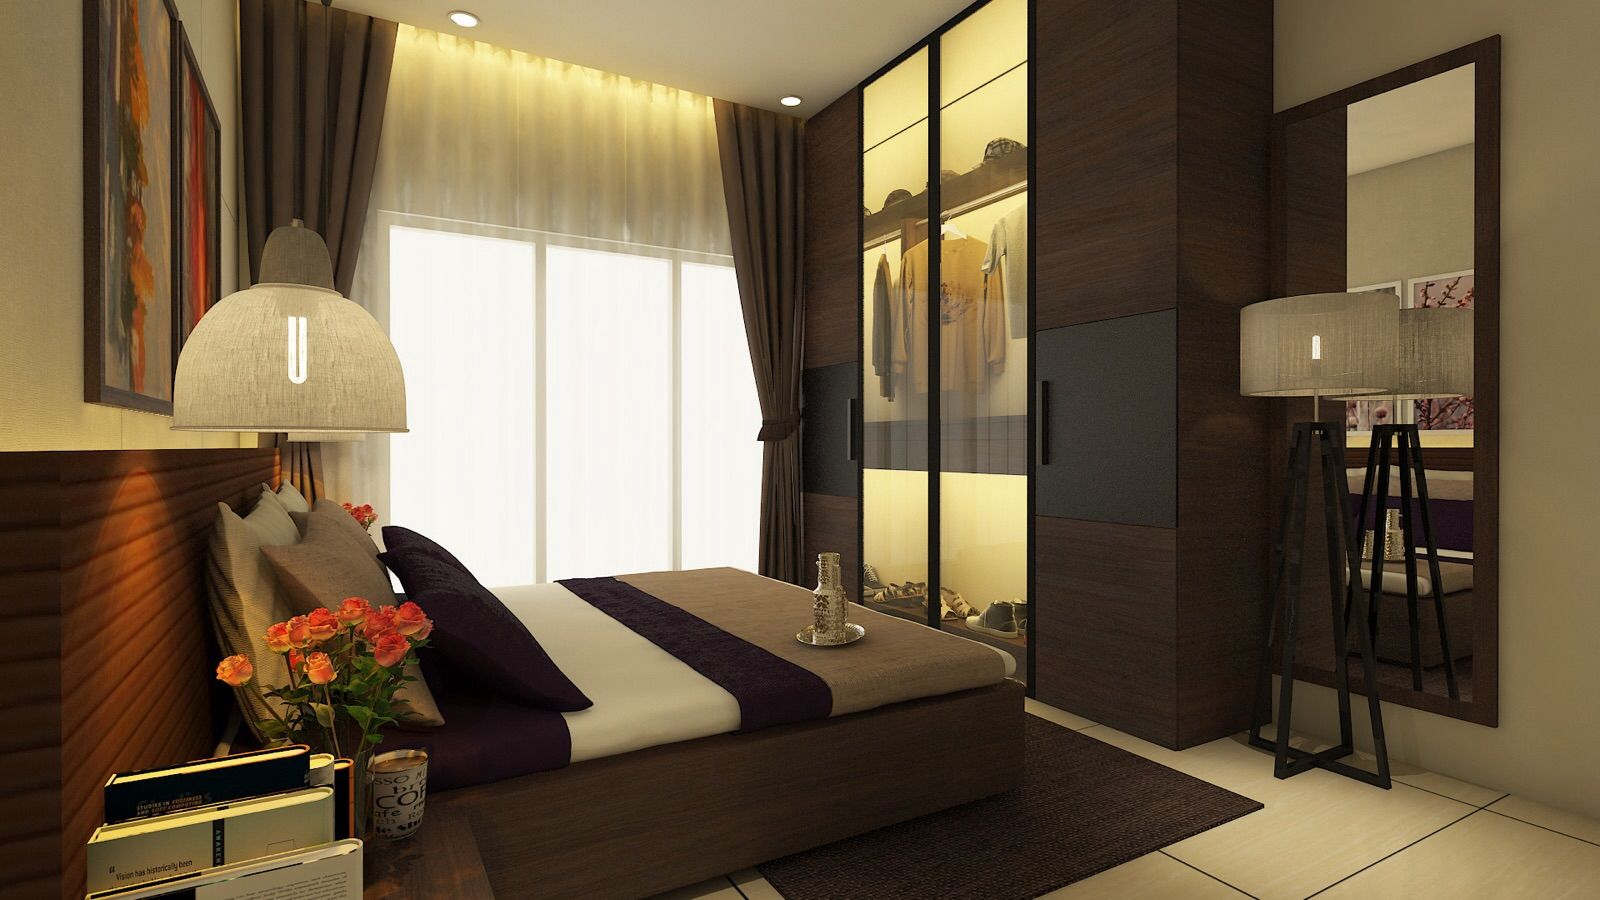 Master Bedroom Residence Sample Flat For Zara Habitats LLP Mumbai IN SAIMA SALAM Design InteriorsInterior